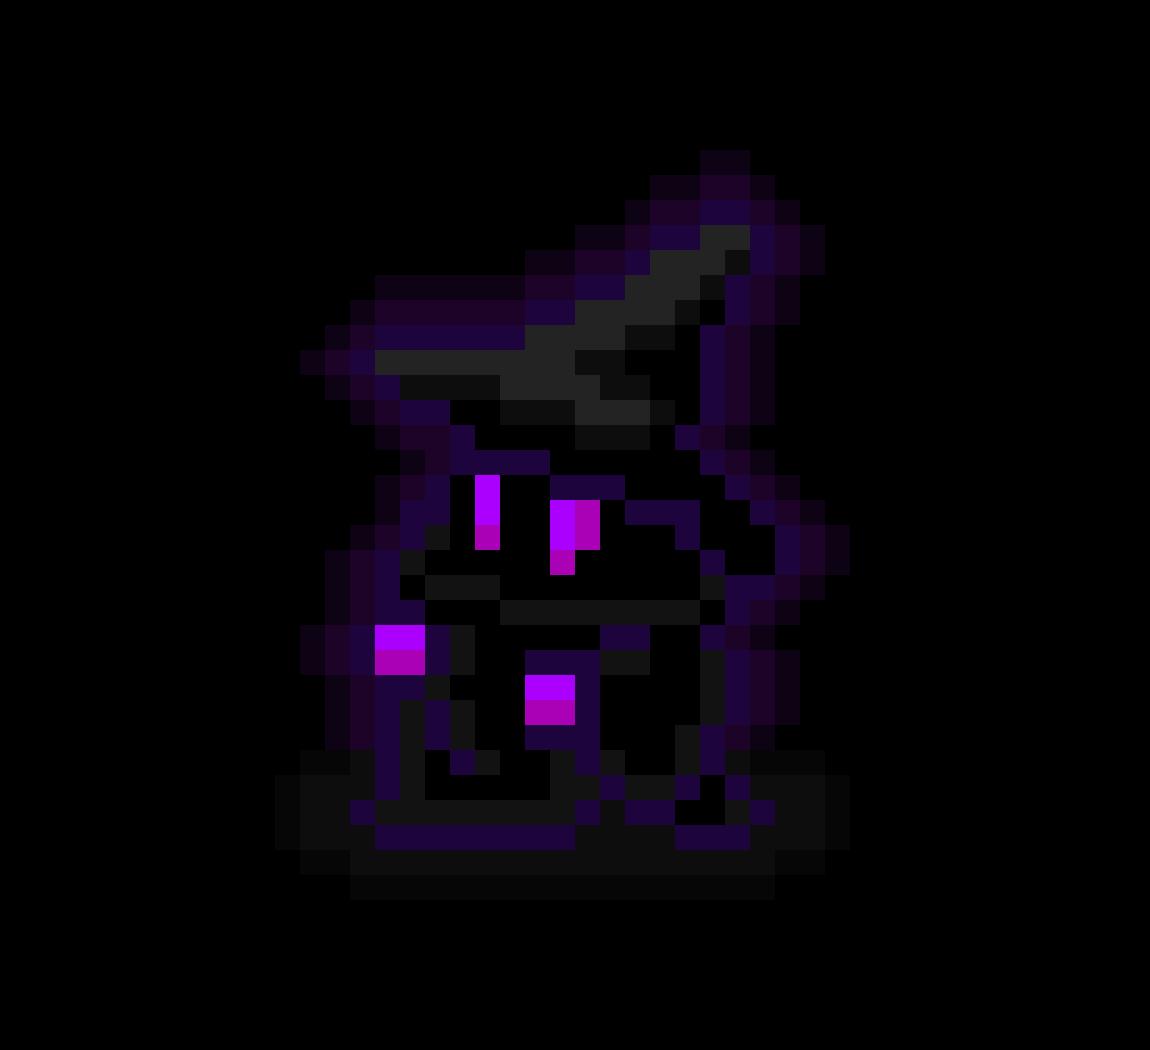 8-bit Purple Wizard